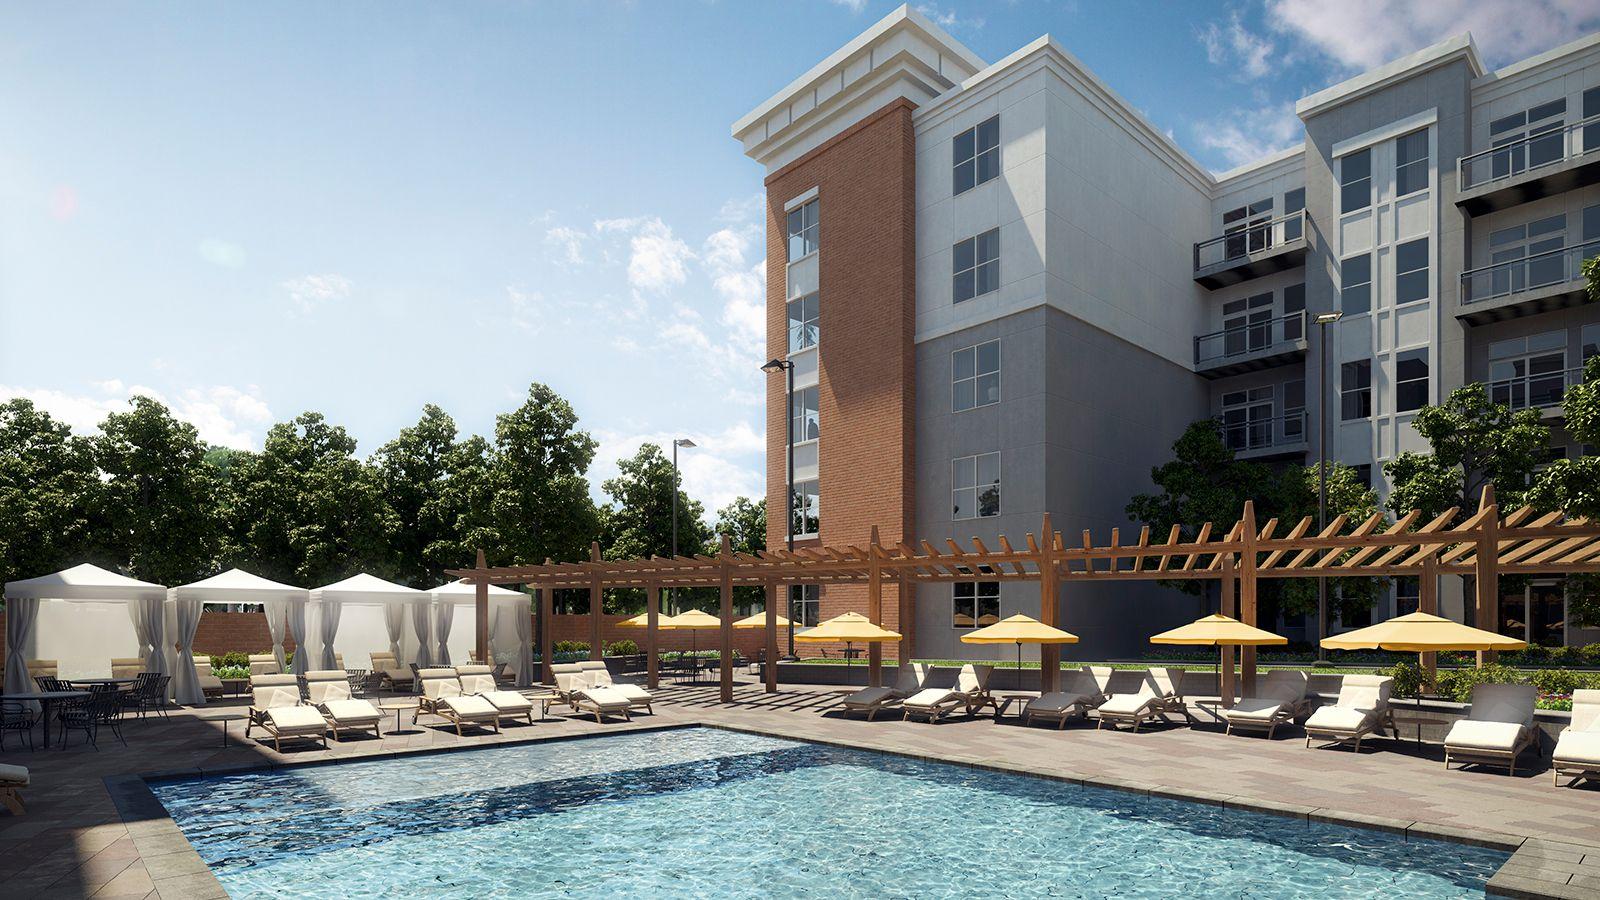 Atmark Cambridge Luxury Apartments Spa Inspiration Apartment Communities